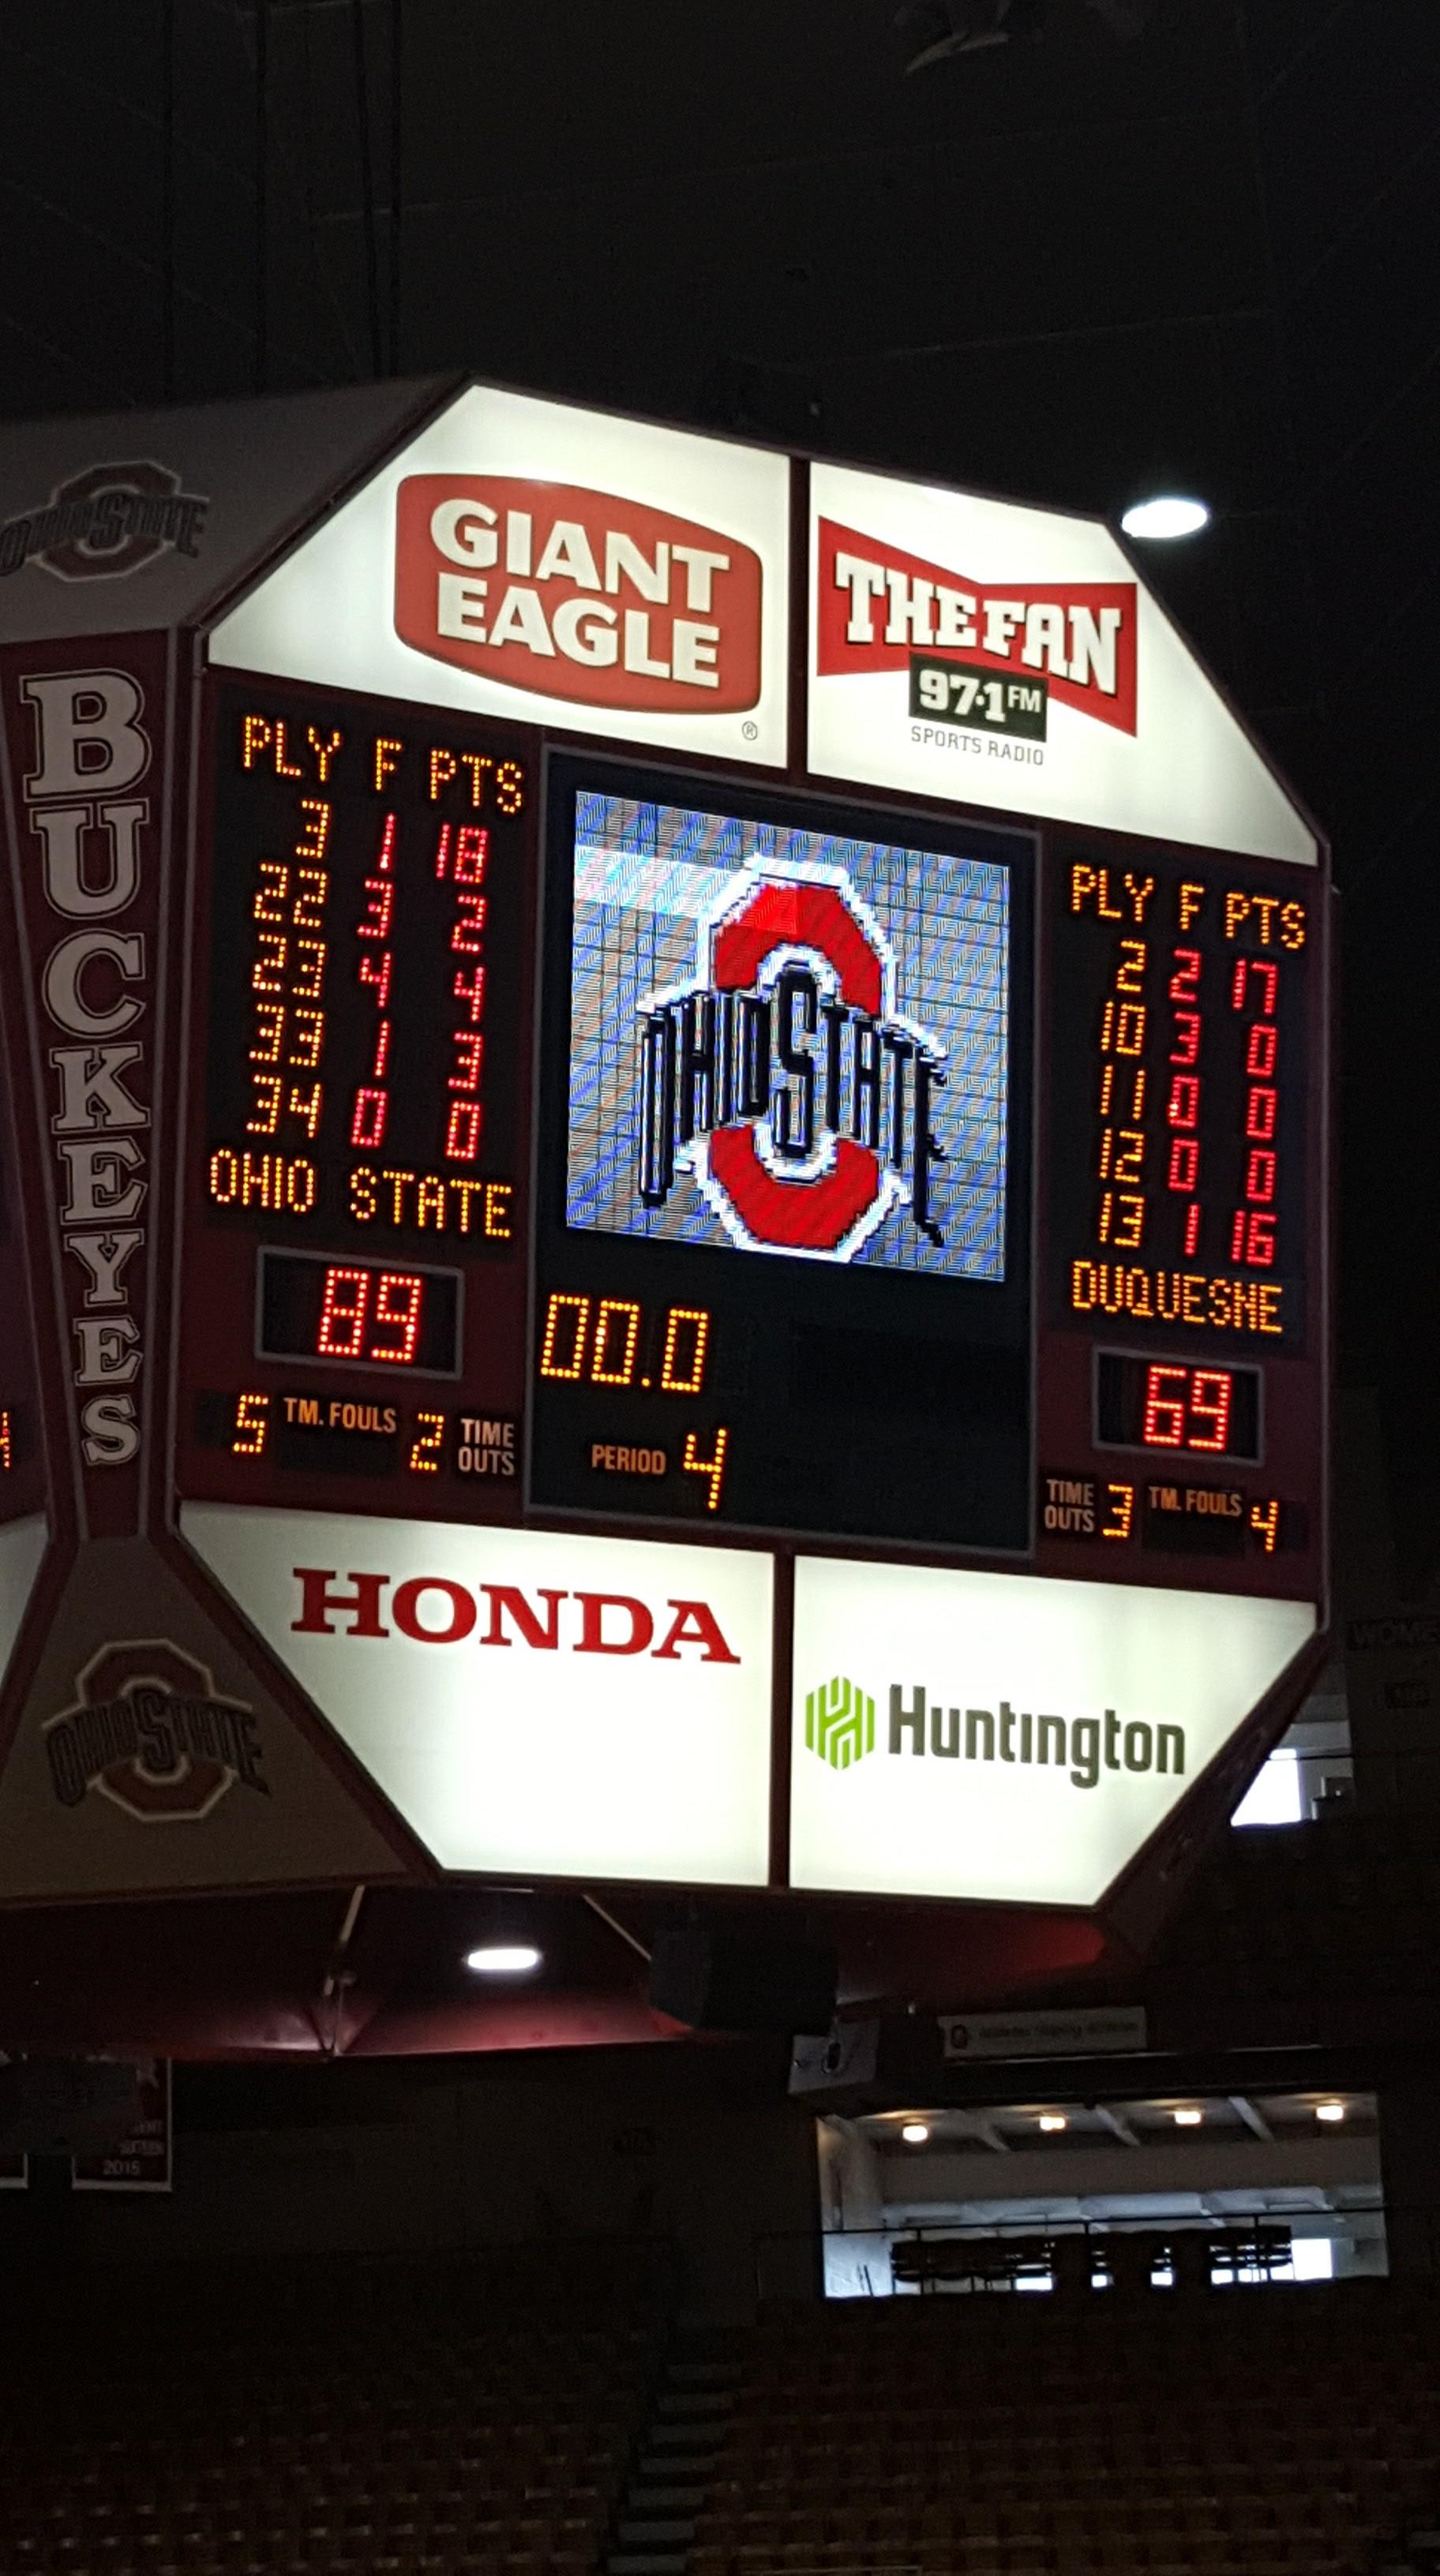 #6 Ohio State Women down Duquesne 89-69